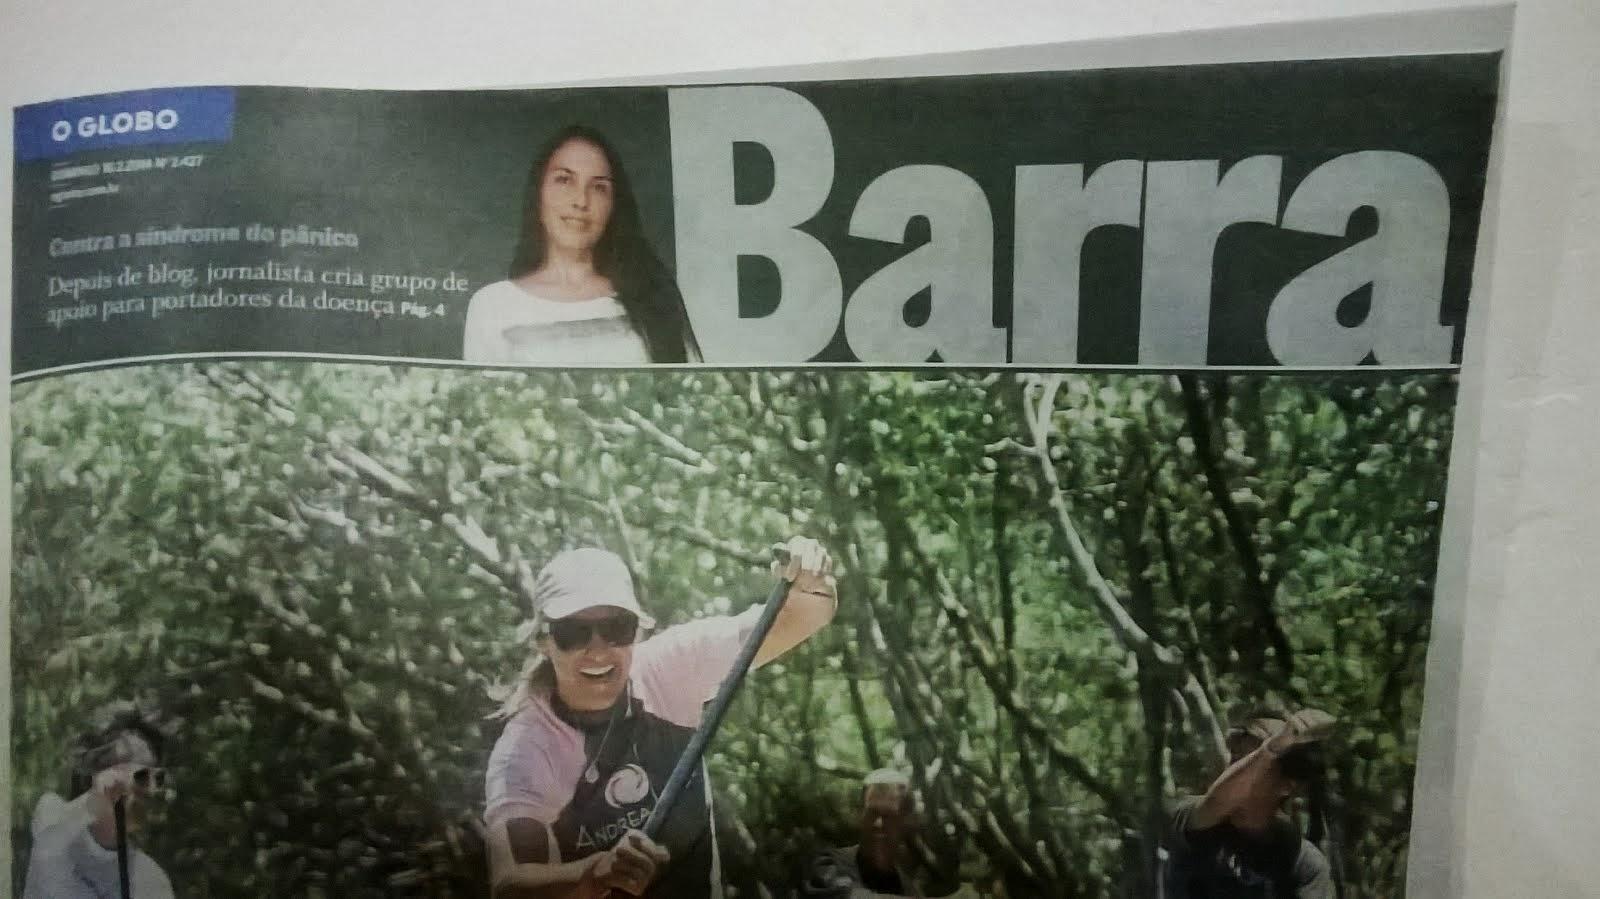 Matéria sobre o grupo de apoio publicada no jornal O Globo Barra (fev/2014)